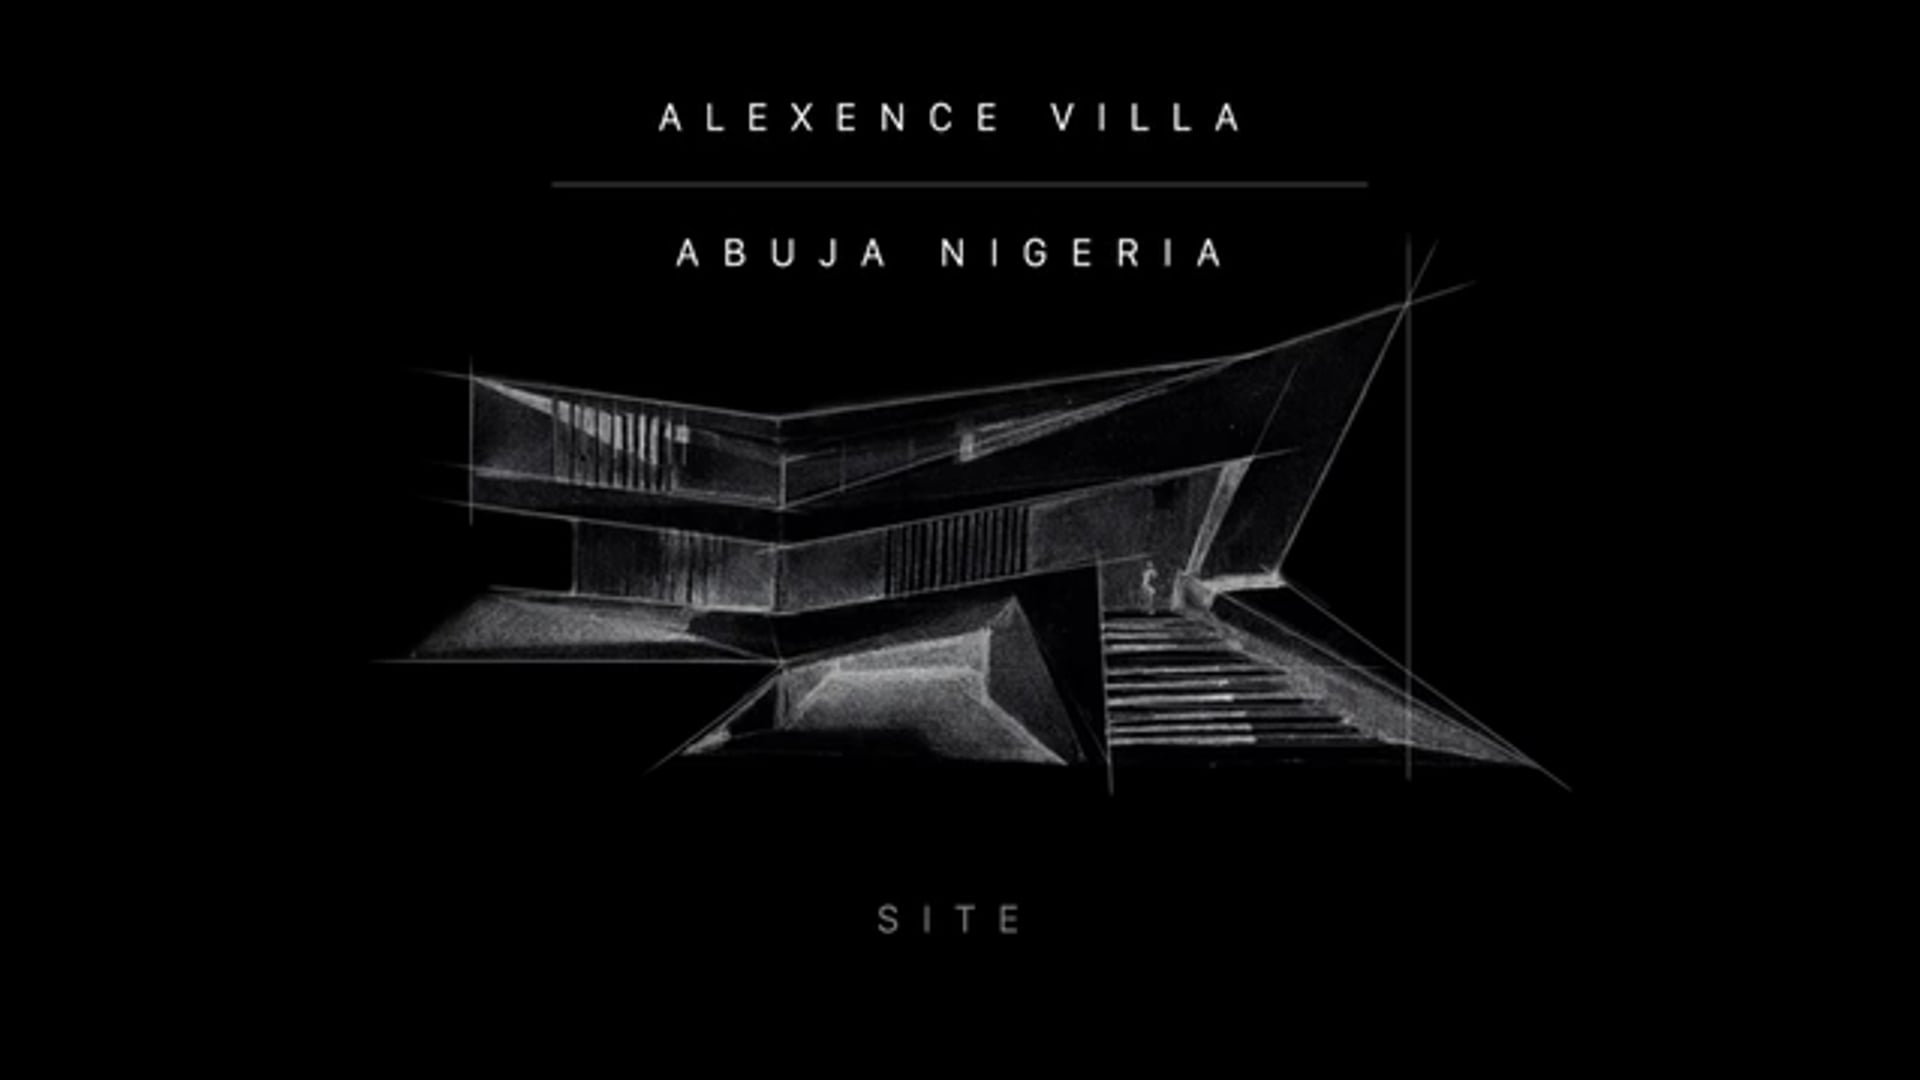 ALEXENCE SITE, NIGERIA